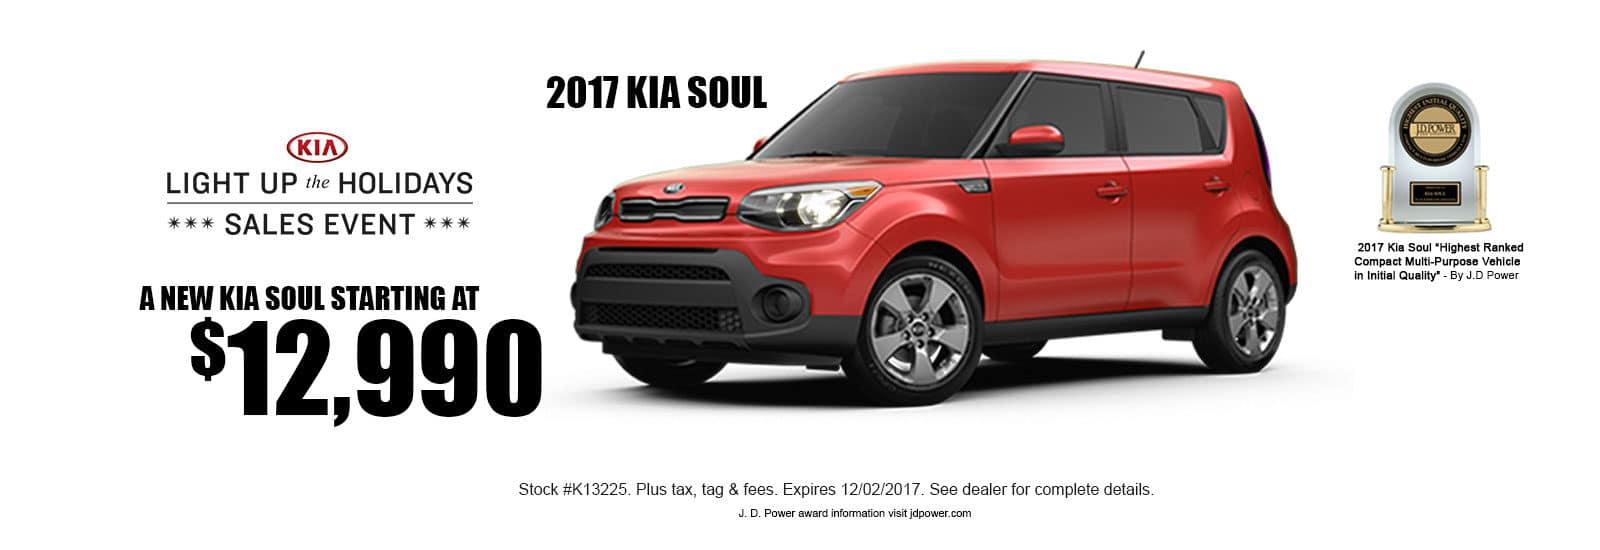 Ray Skillman Kia >> Ray Skillman Westside Auto Mall: Indianapolis Hyundai, Kia ...